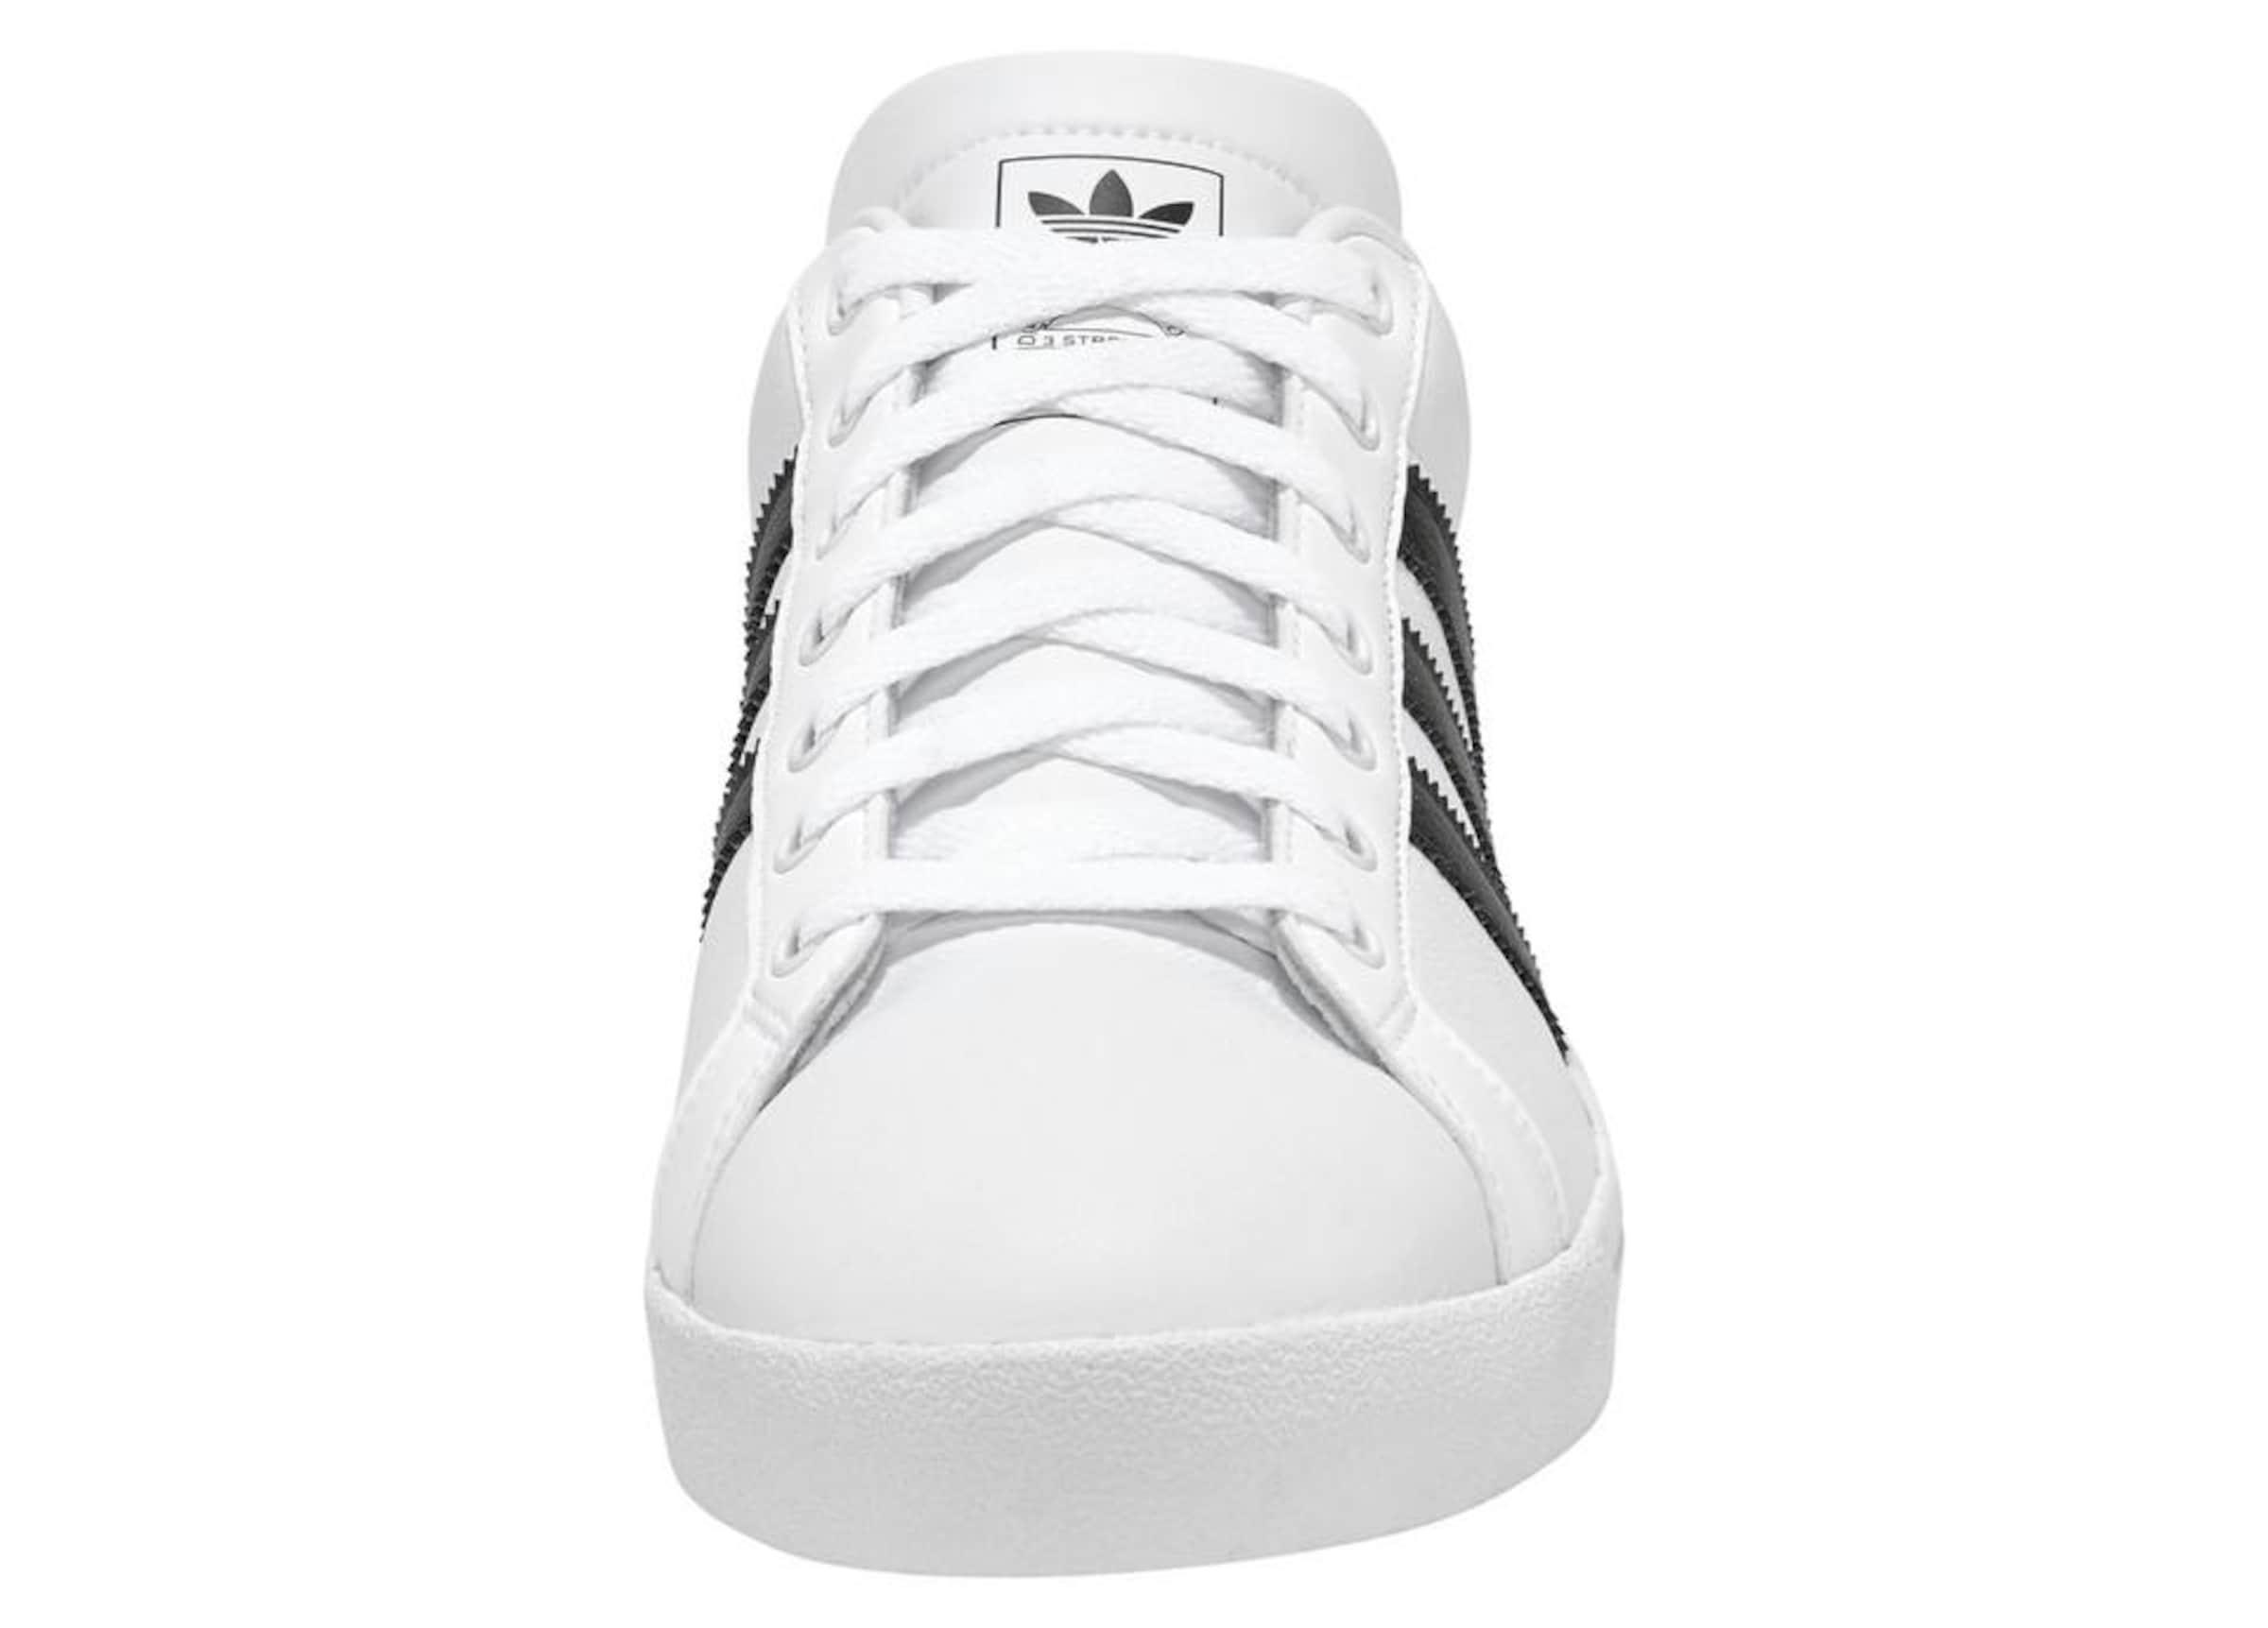 Originals 'coast Adidas Star' SchwarzWeiß Schuh In c3F1TlKJ